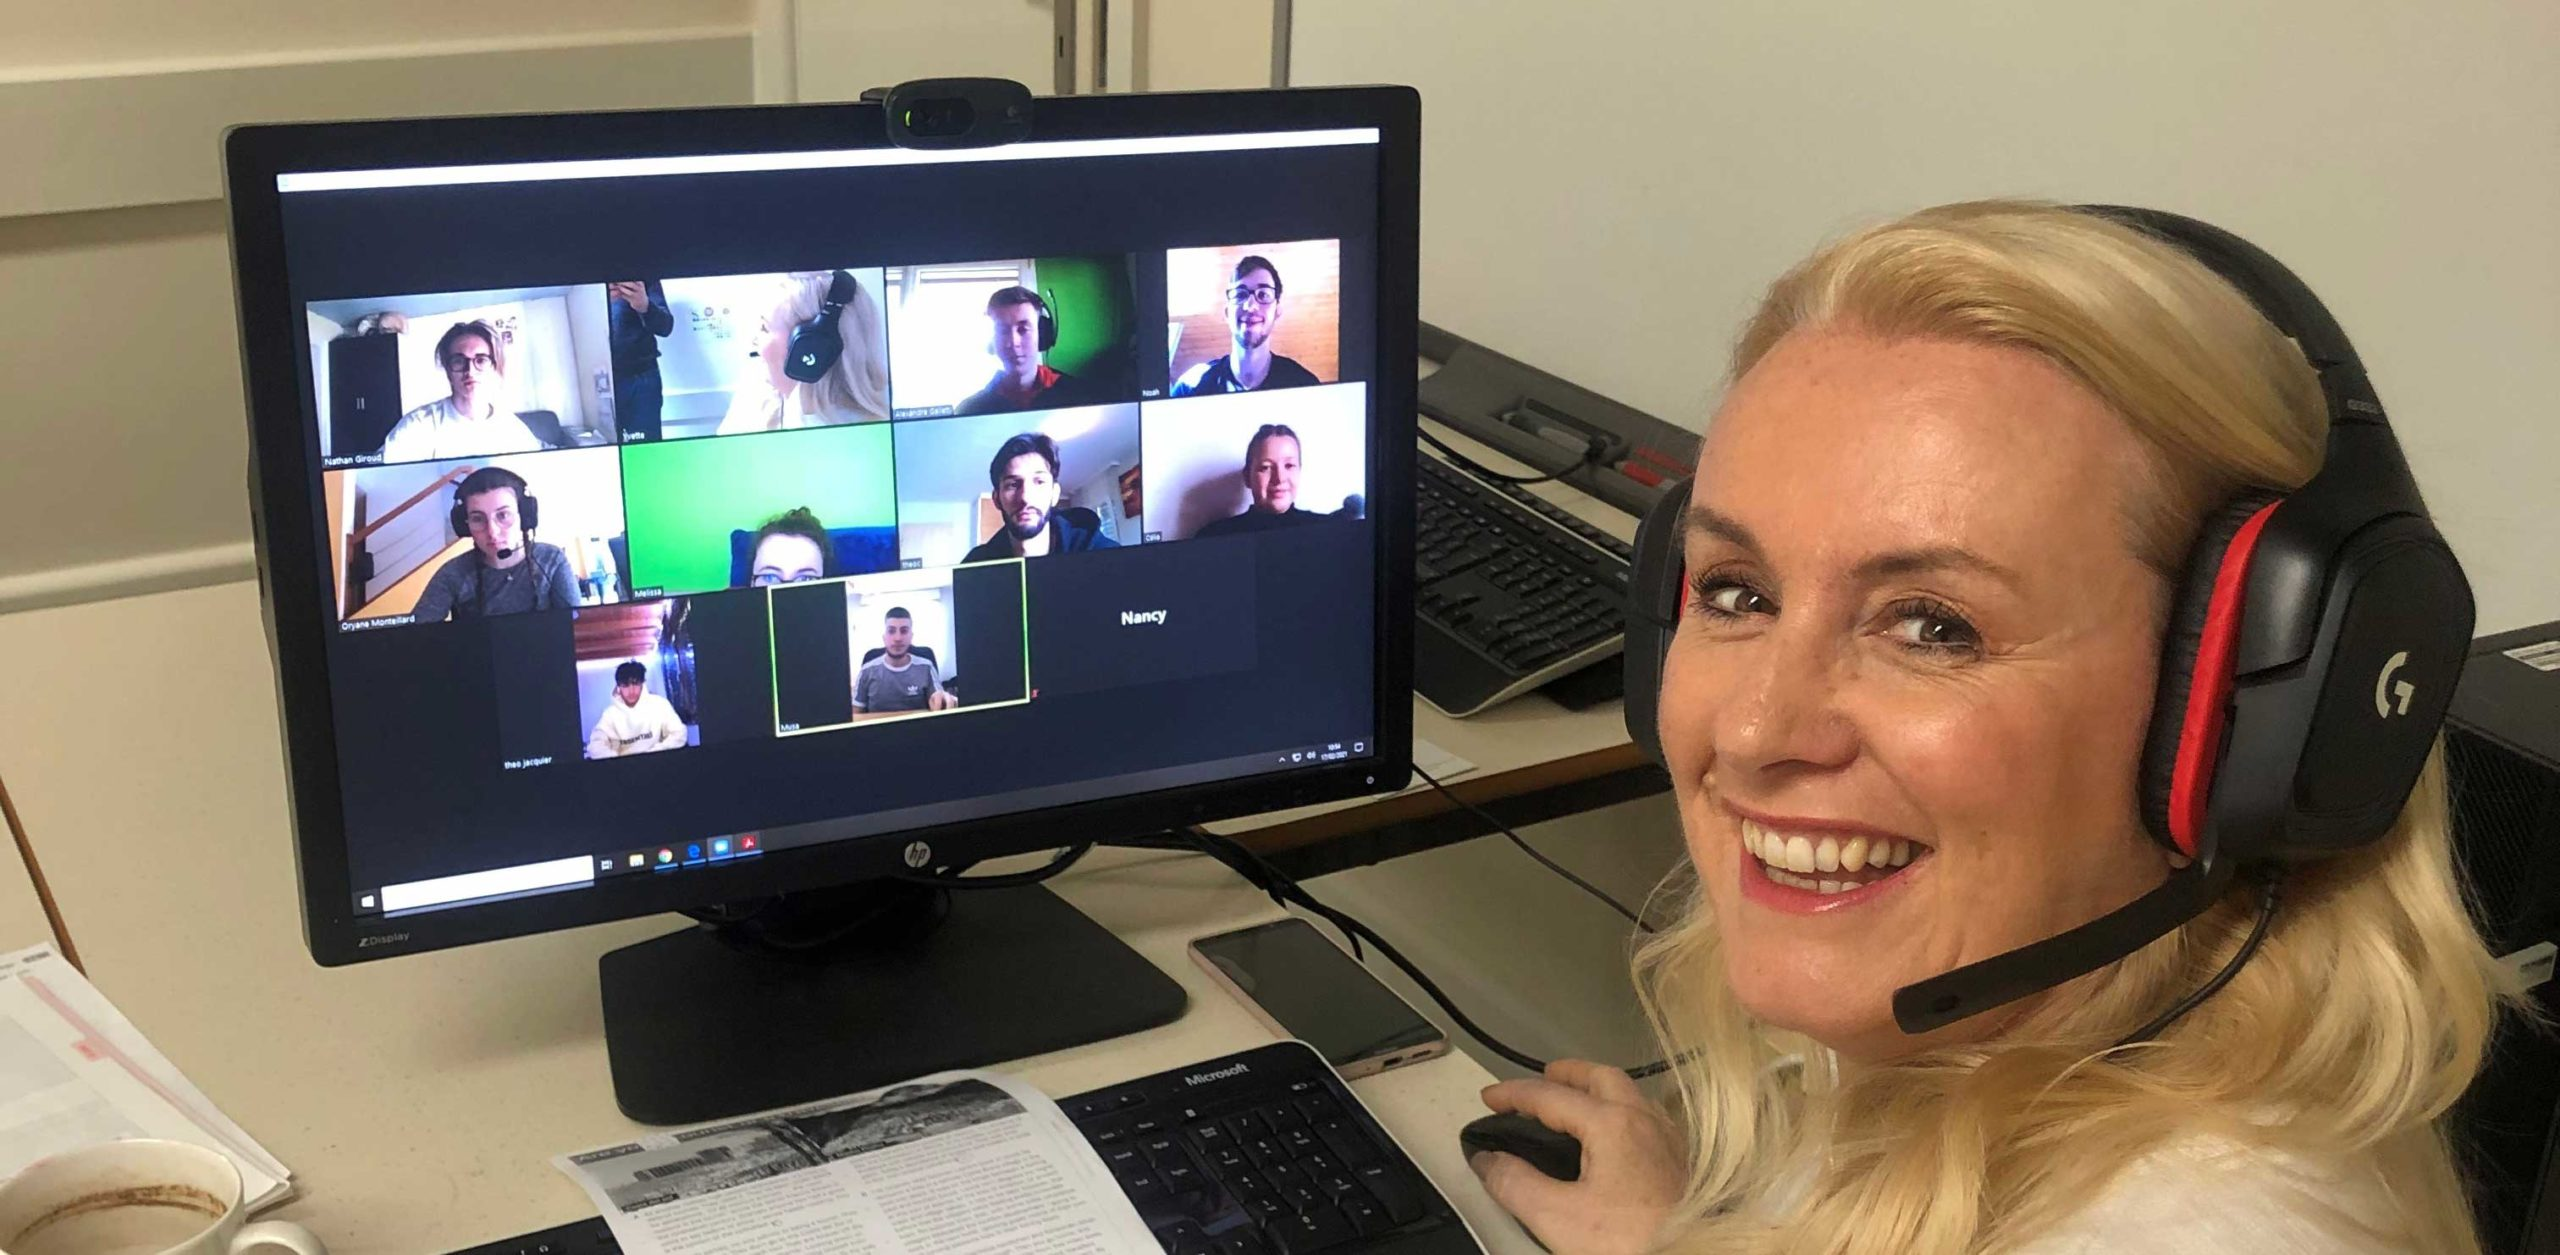 Yvette teaching students via video call